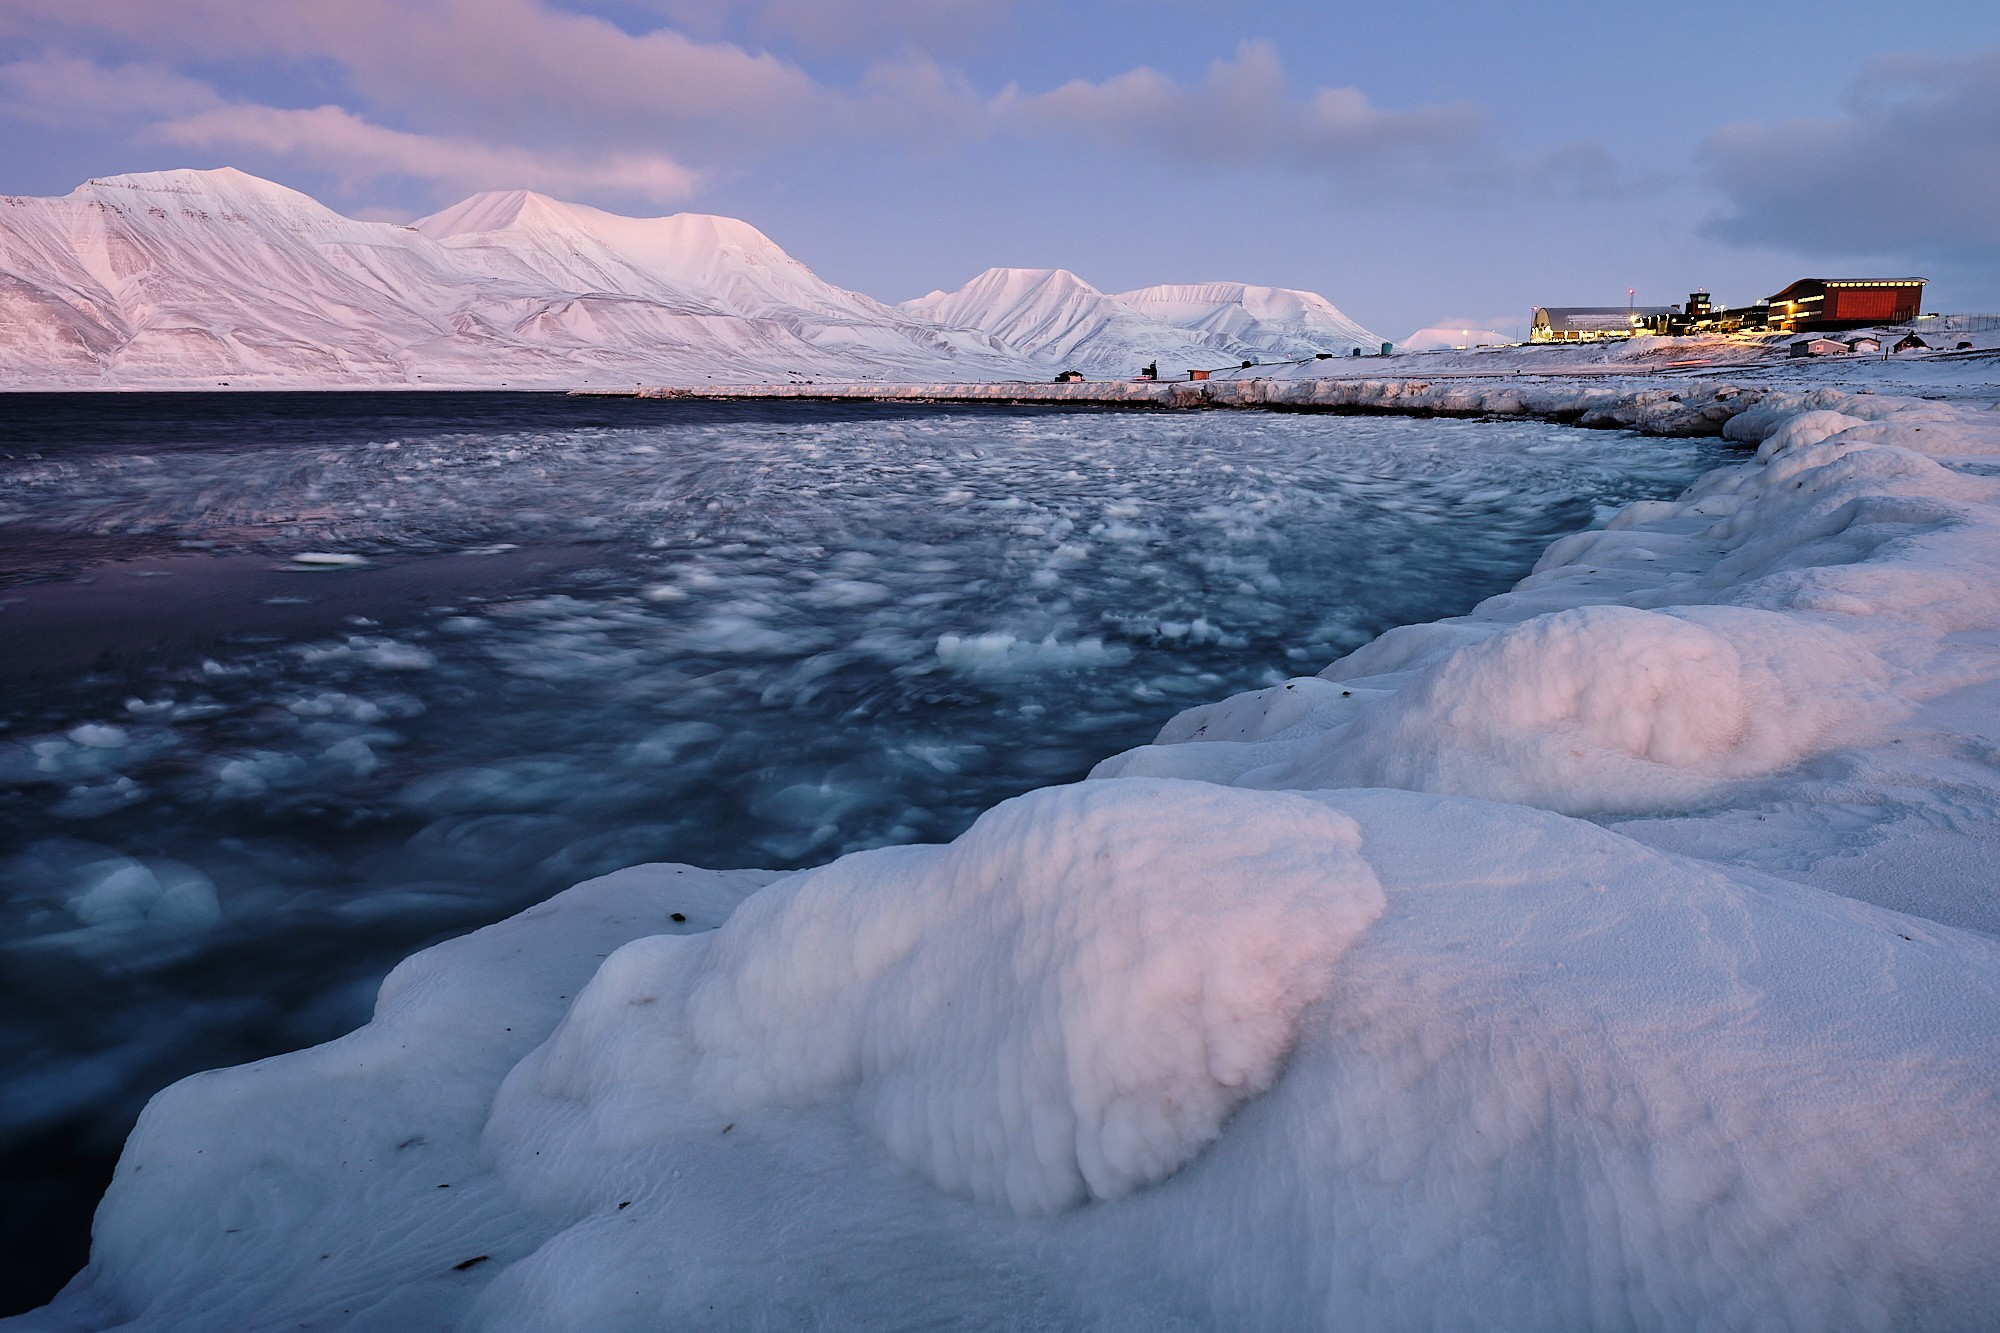 Letiště v Longyearbyenu (Fujifilm X-T2 + XF16mmF1.4 R WR, f/5.6, 1.7s, ISO200)